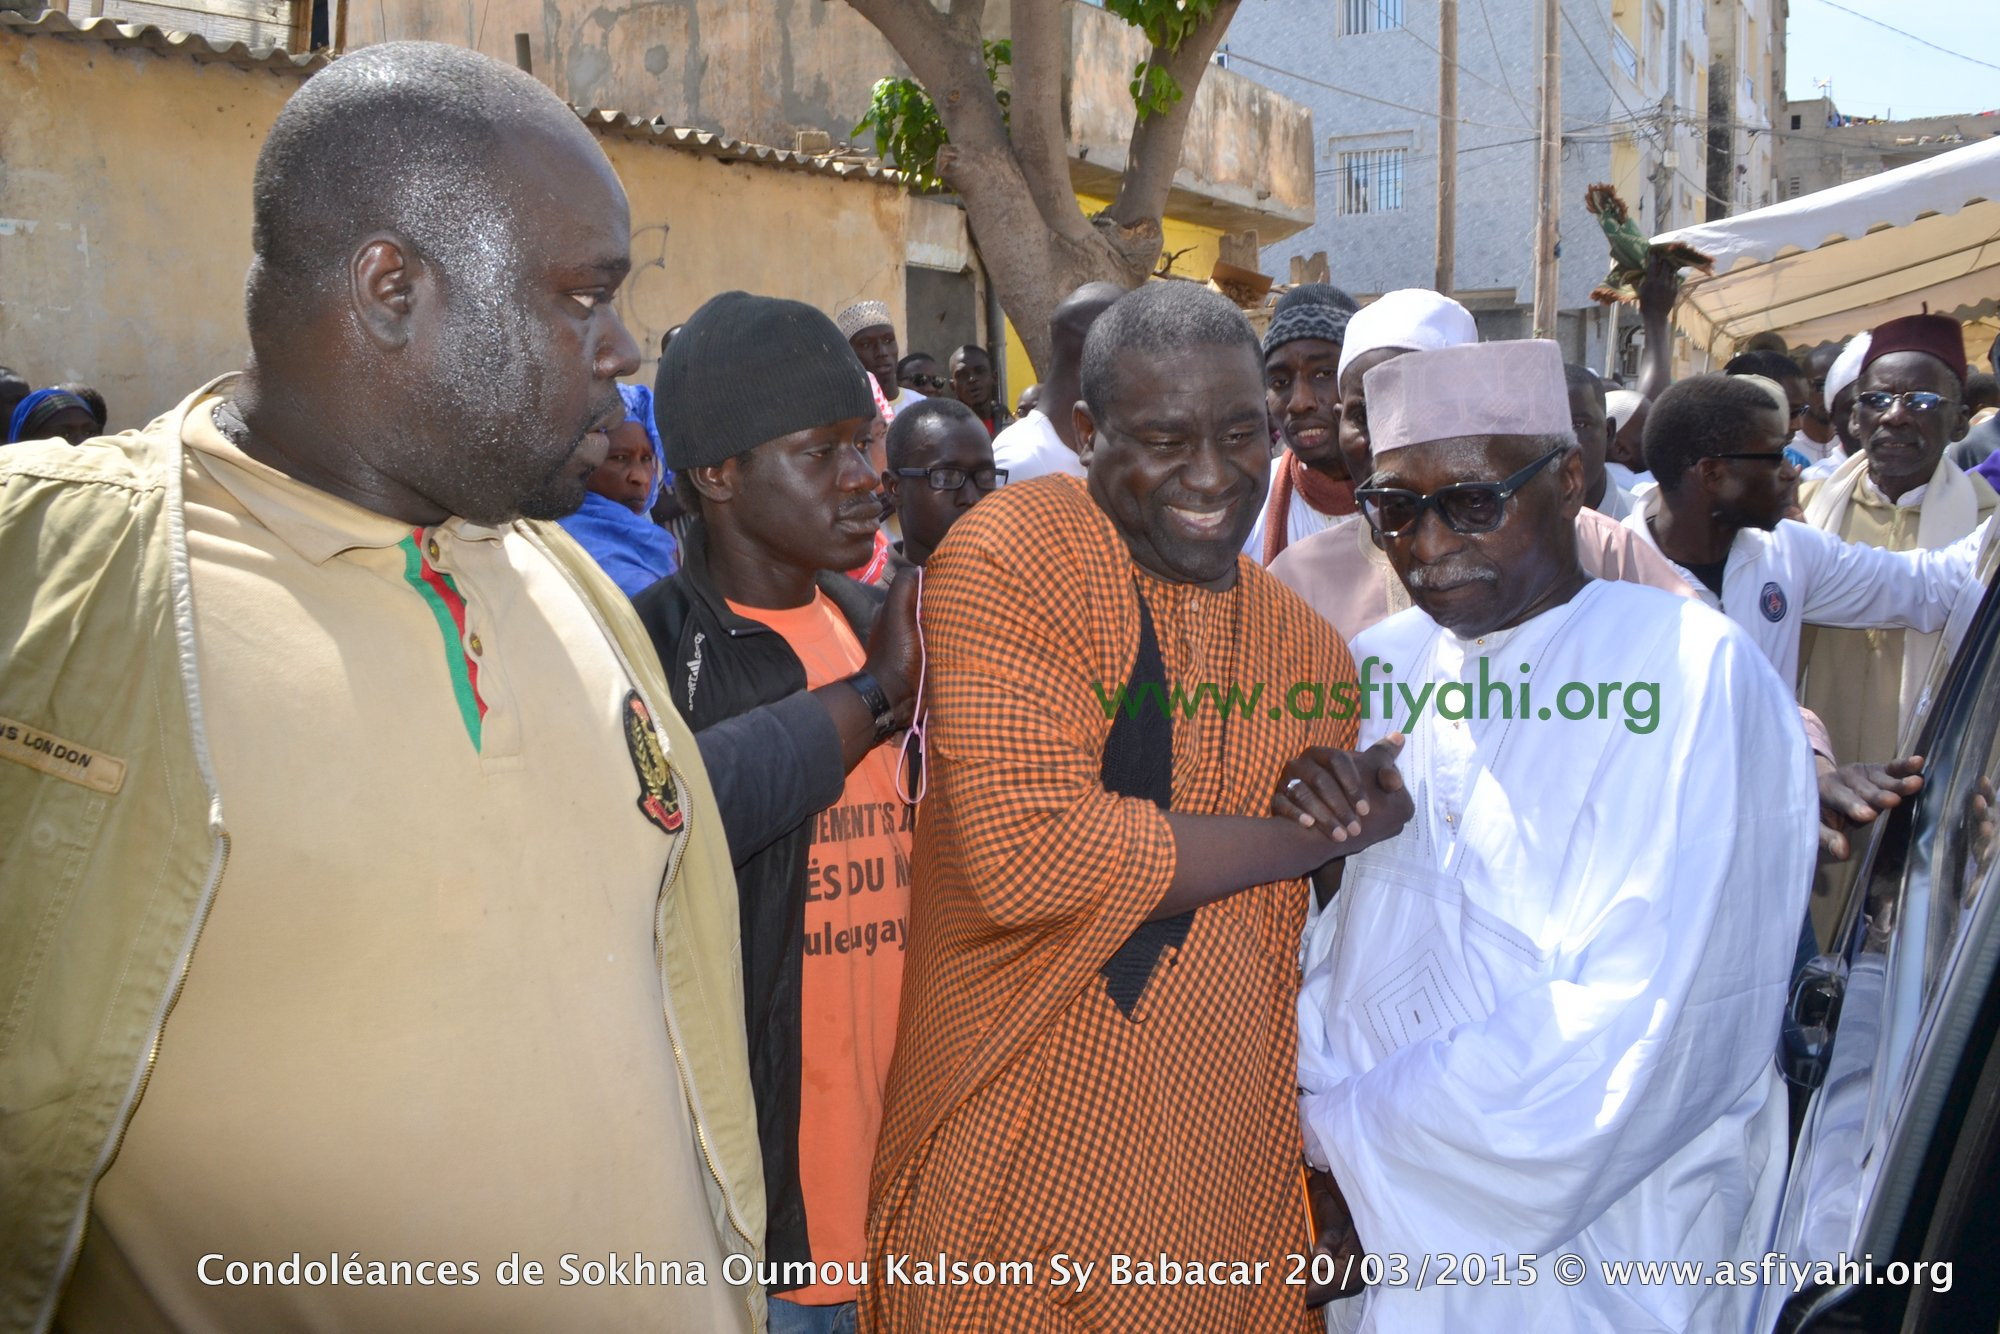 Serigne Cheikh Oumar Sy Djamil accompagnant son Oncle Serigne Mbaye Sy Mansour